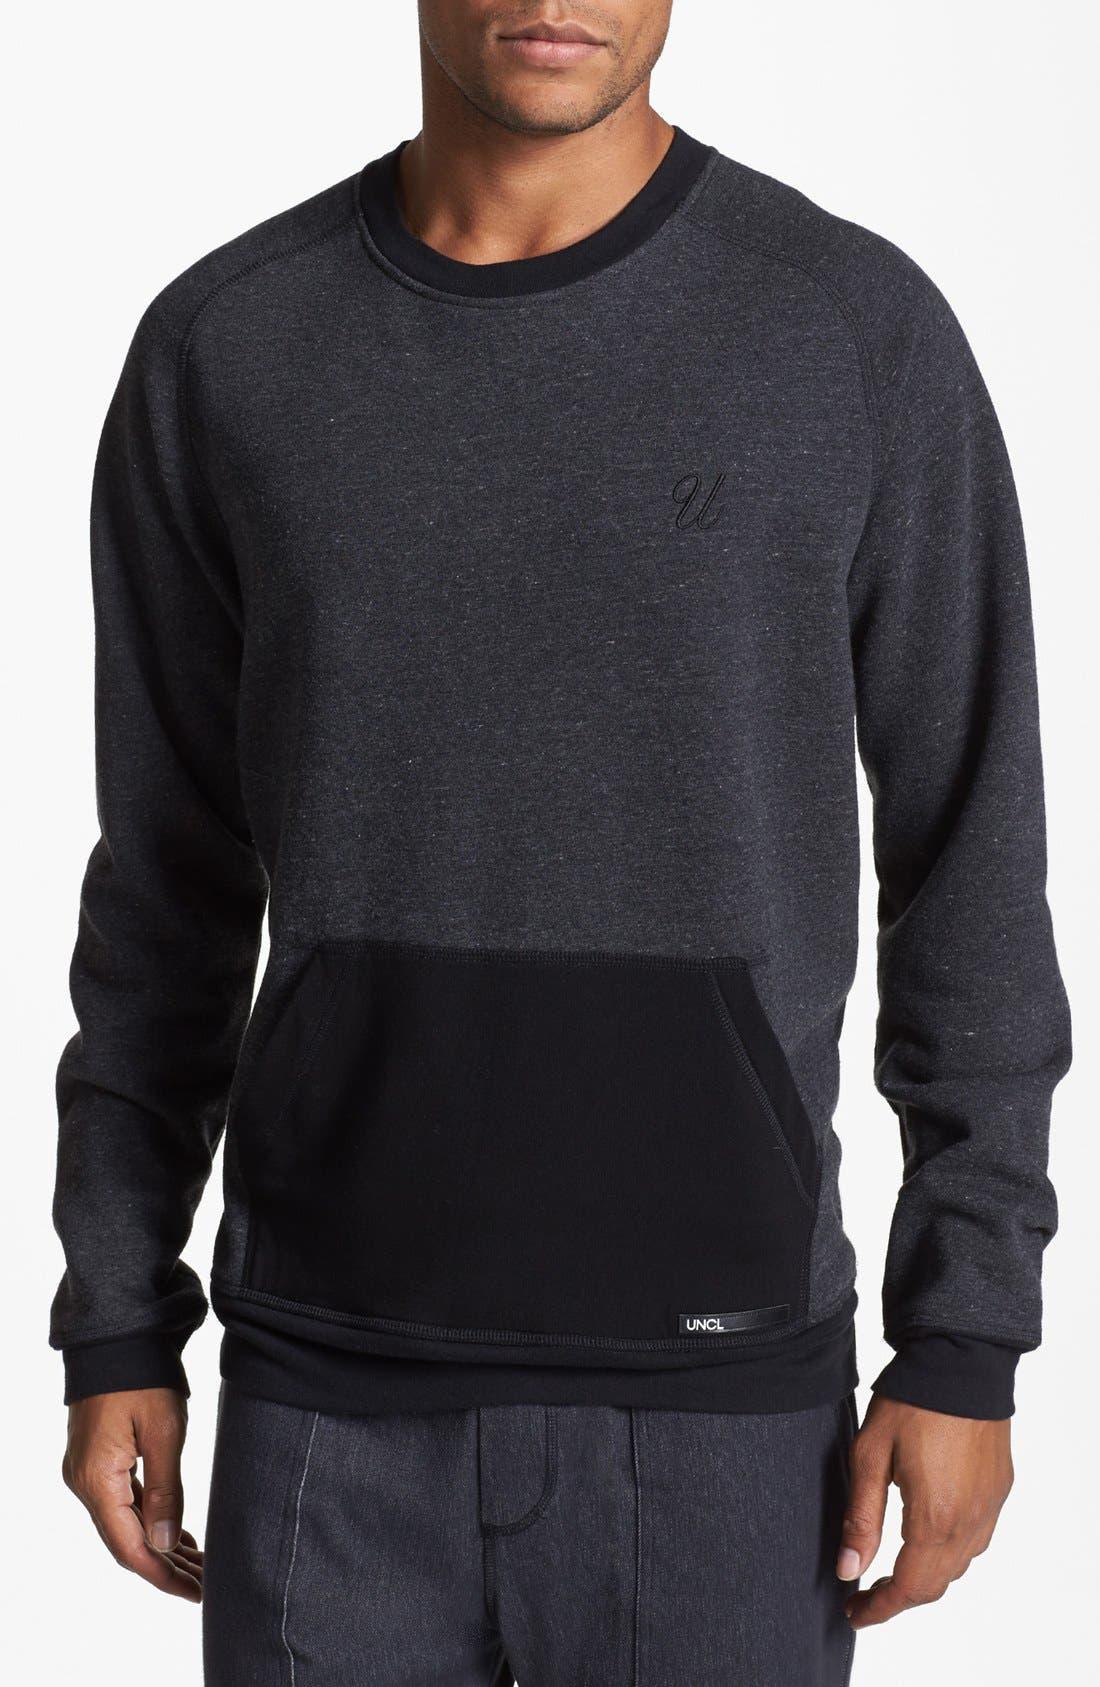 Main Image - UNCL Raglan Crewneck Sweater